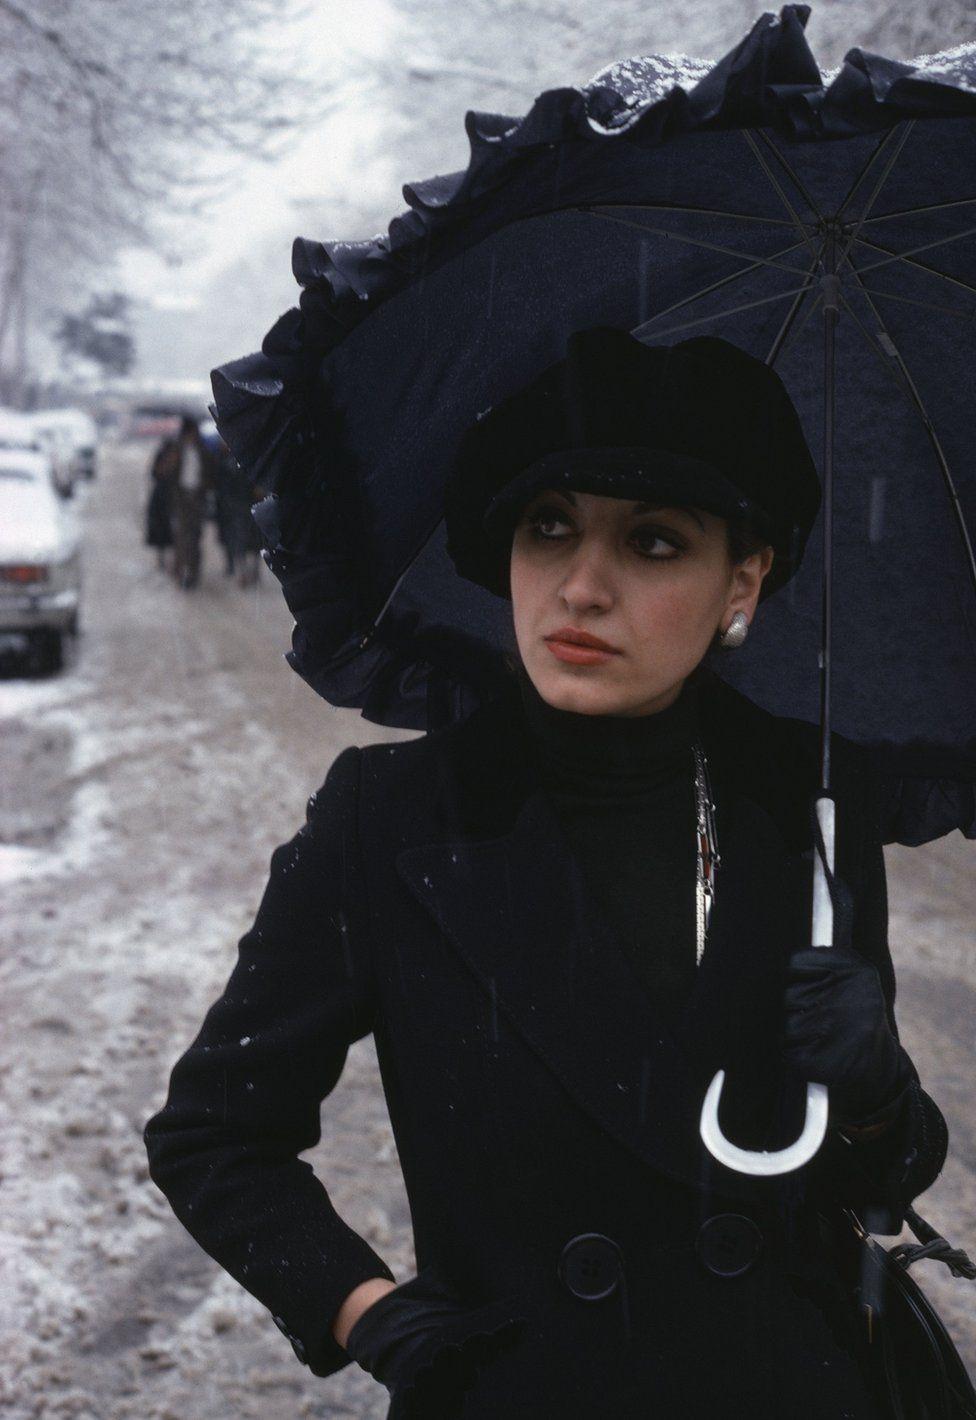 Stylish student walks in the snow in Tehran in 1976